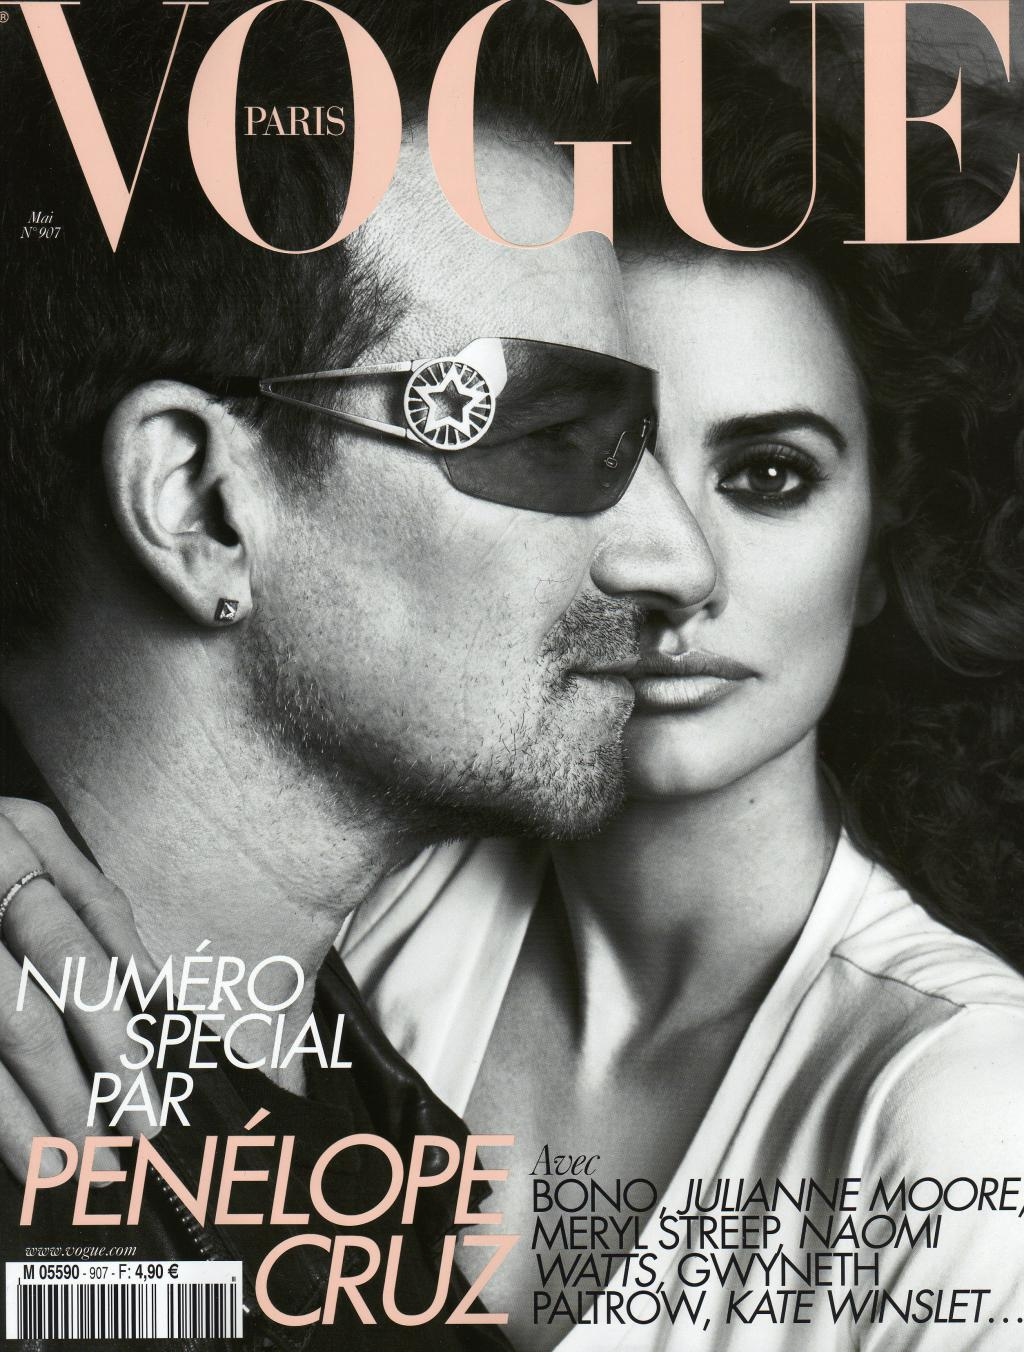 http://2.bp.blogspot.com/_aBZm-R5HKEM/S-XU72MXiYI/AAAAAAAAI9I/OSXao8cW_wM/s1600/2+Bono+and+Penelope+Cruz.jpg